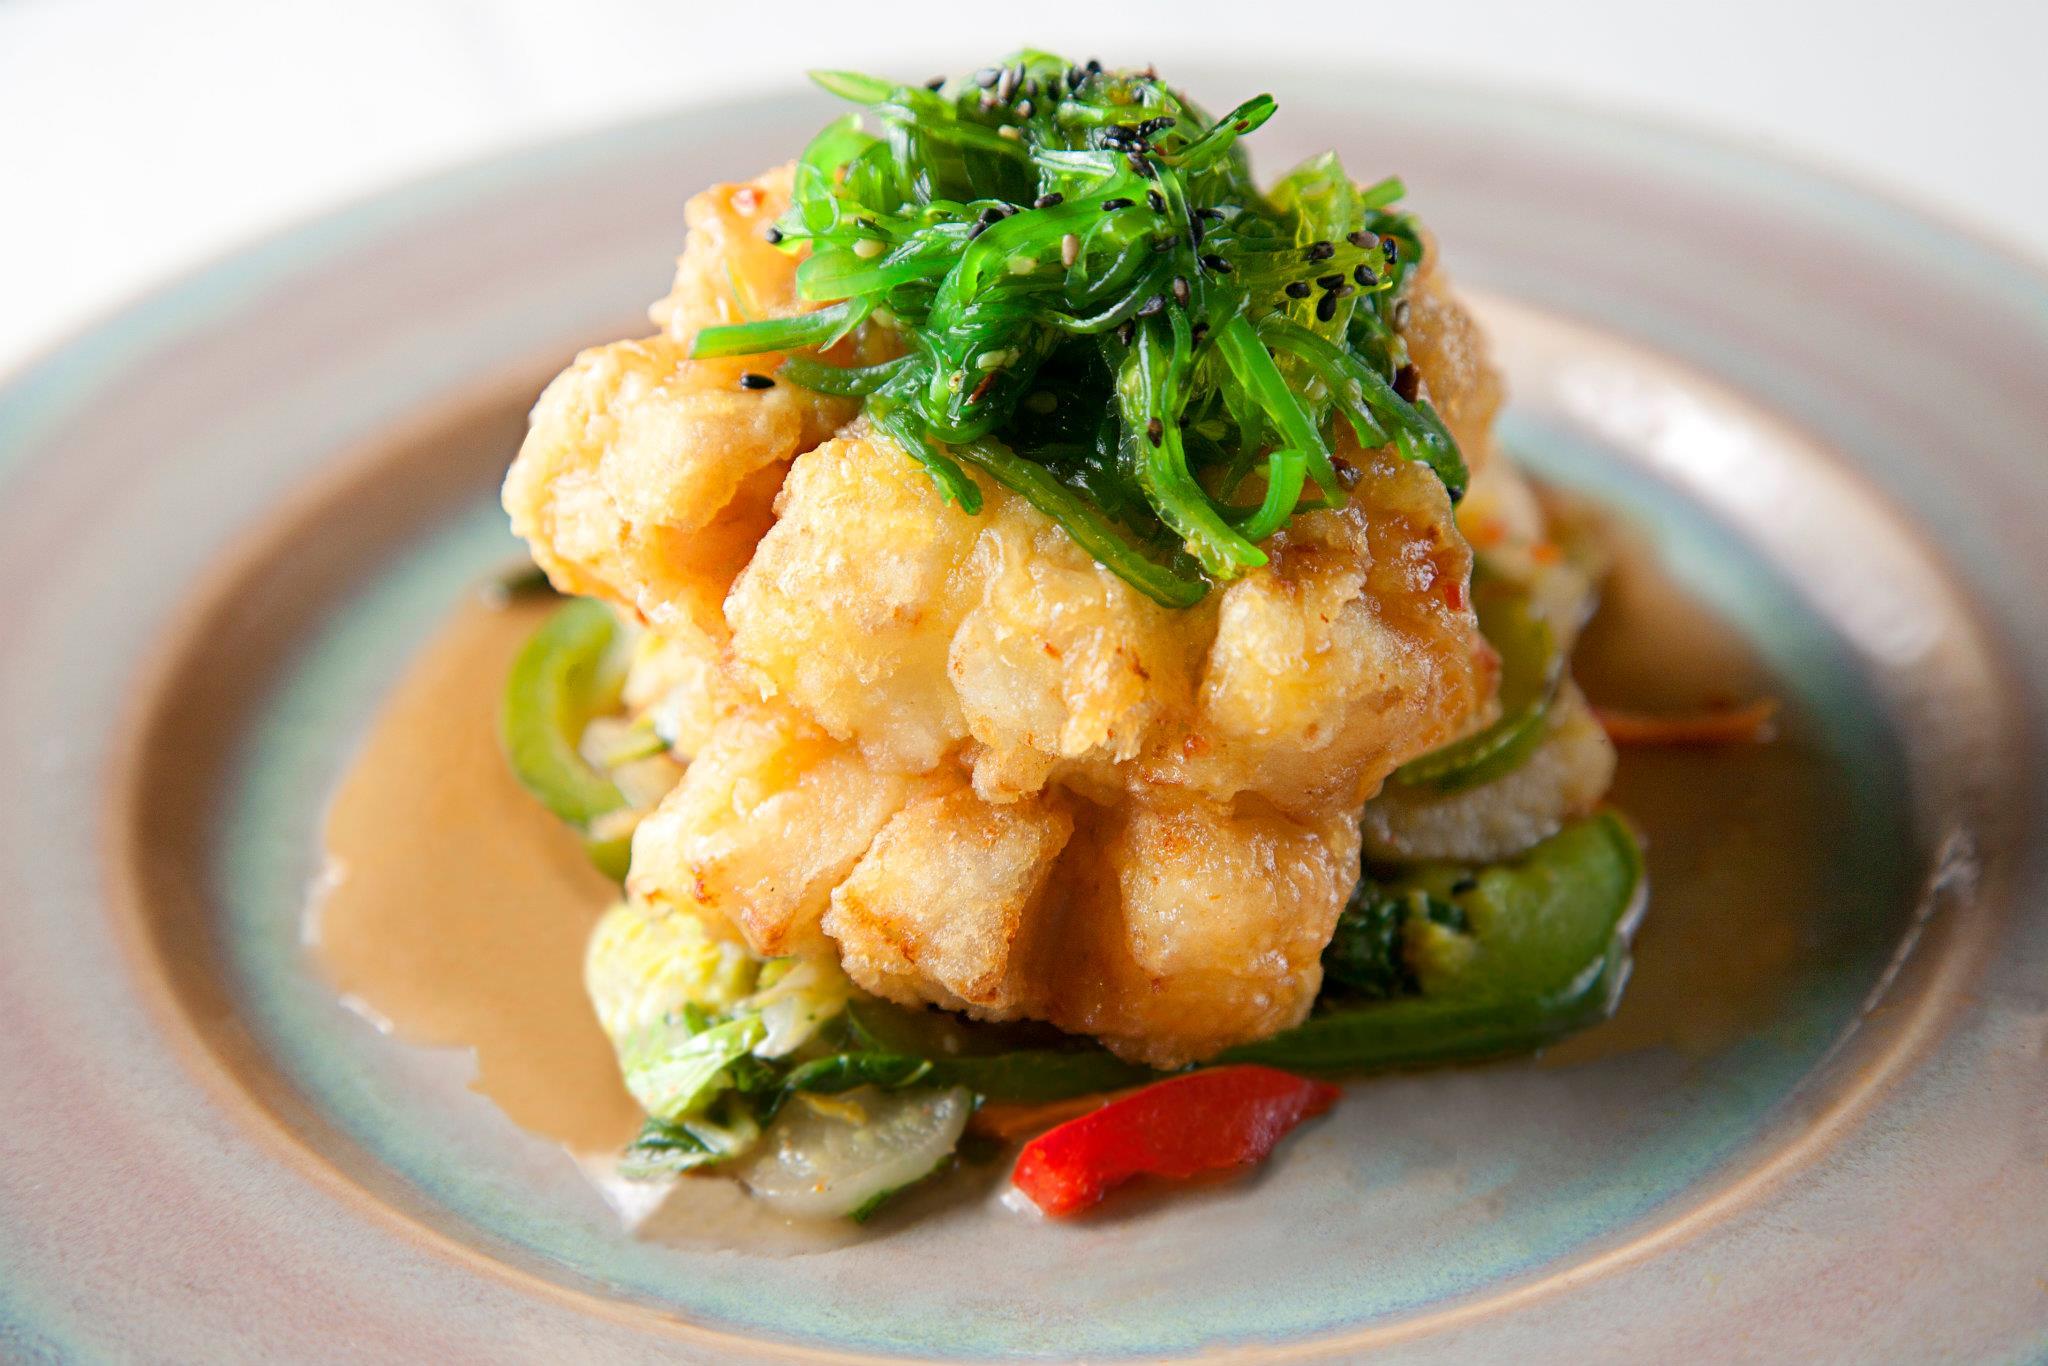 Photo gallery basmati s asian cuisine basmati 39 s asian - Photo cuisine ...